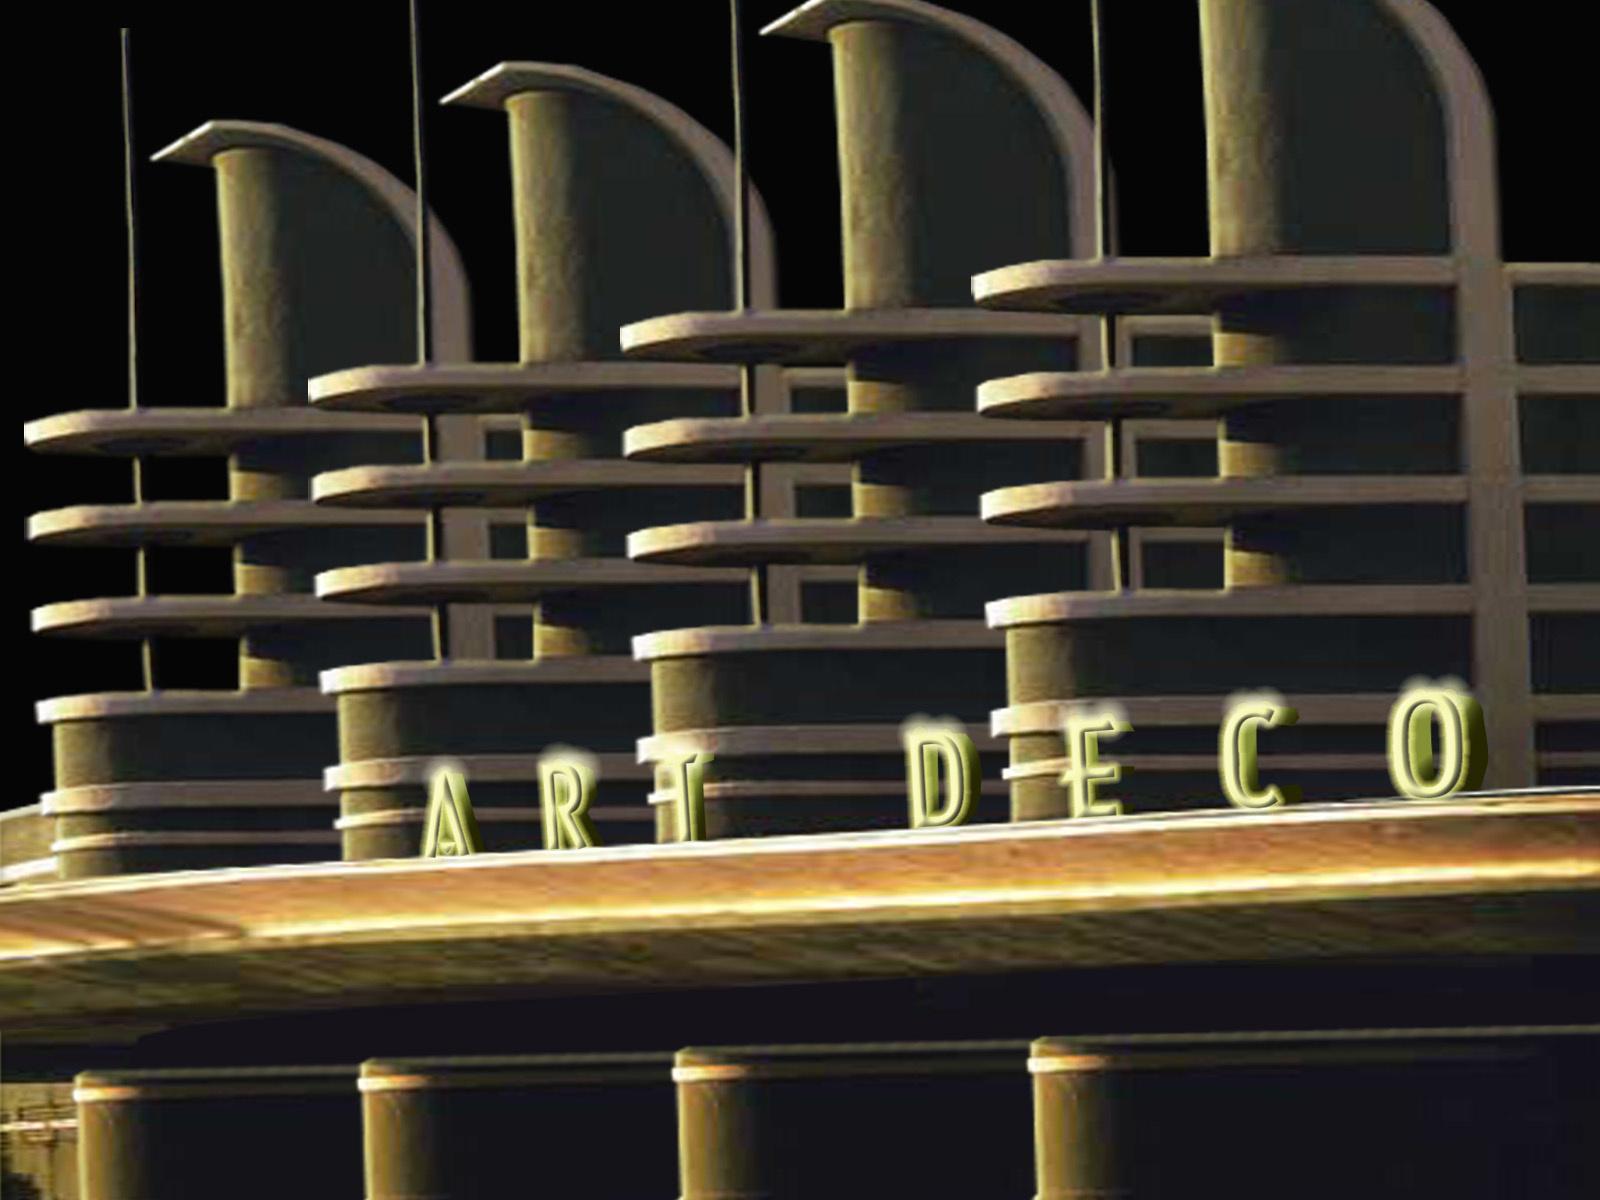 Art Deco Streamline Moderne By Jhihmoac Caedes Desktop Wallpaper